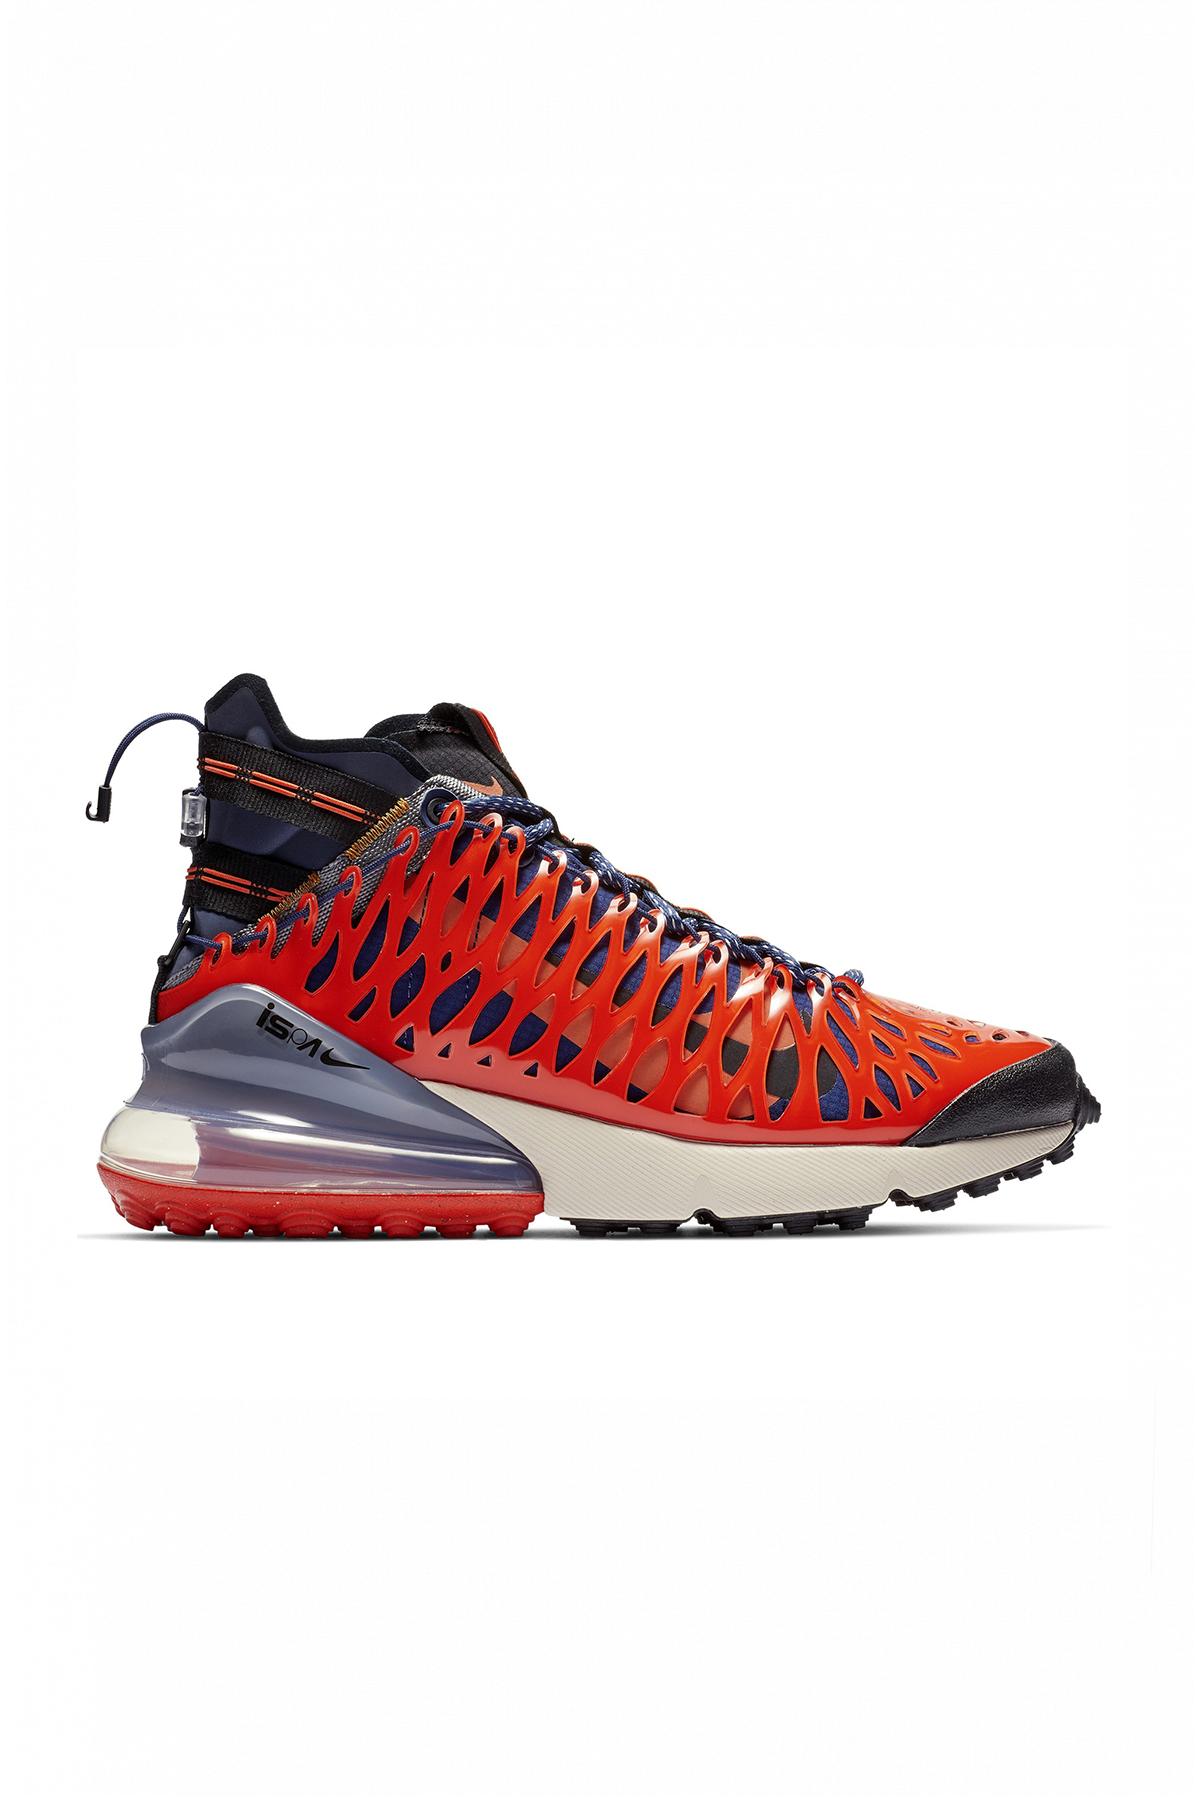 c72d2674 Кроссовки Nike Air Max 270 SP ISPA SOE Terra Orange - Интернет-магазин КМ20